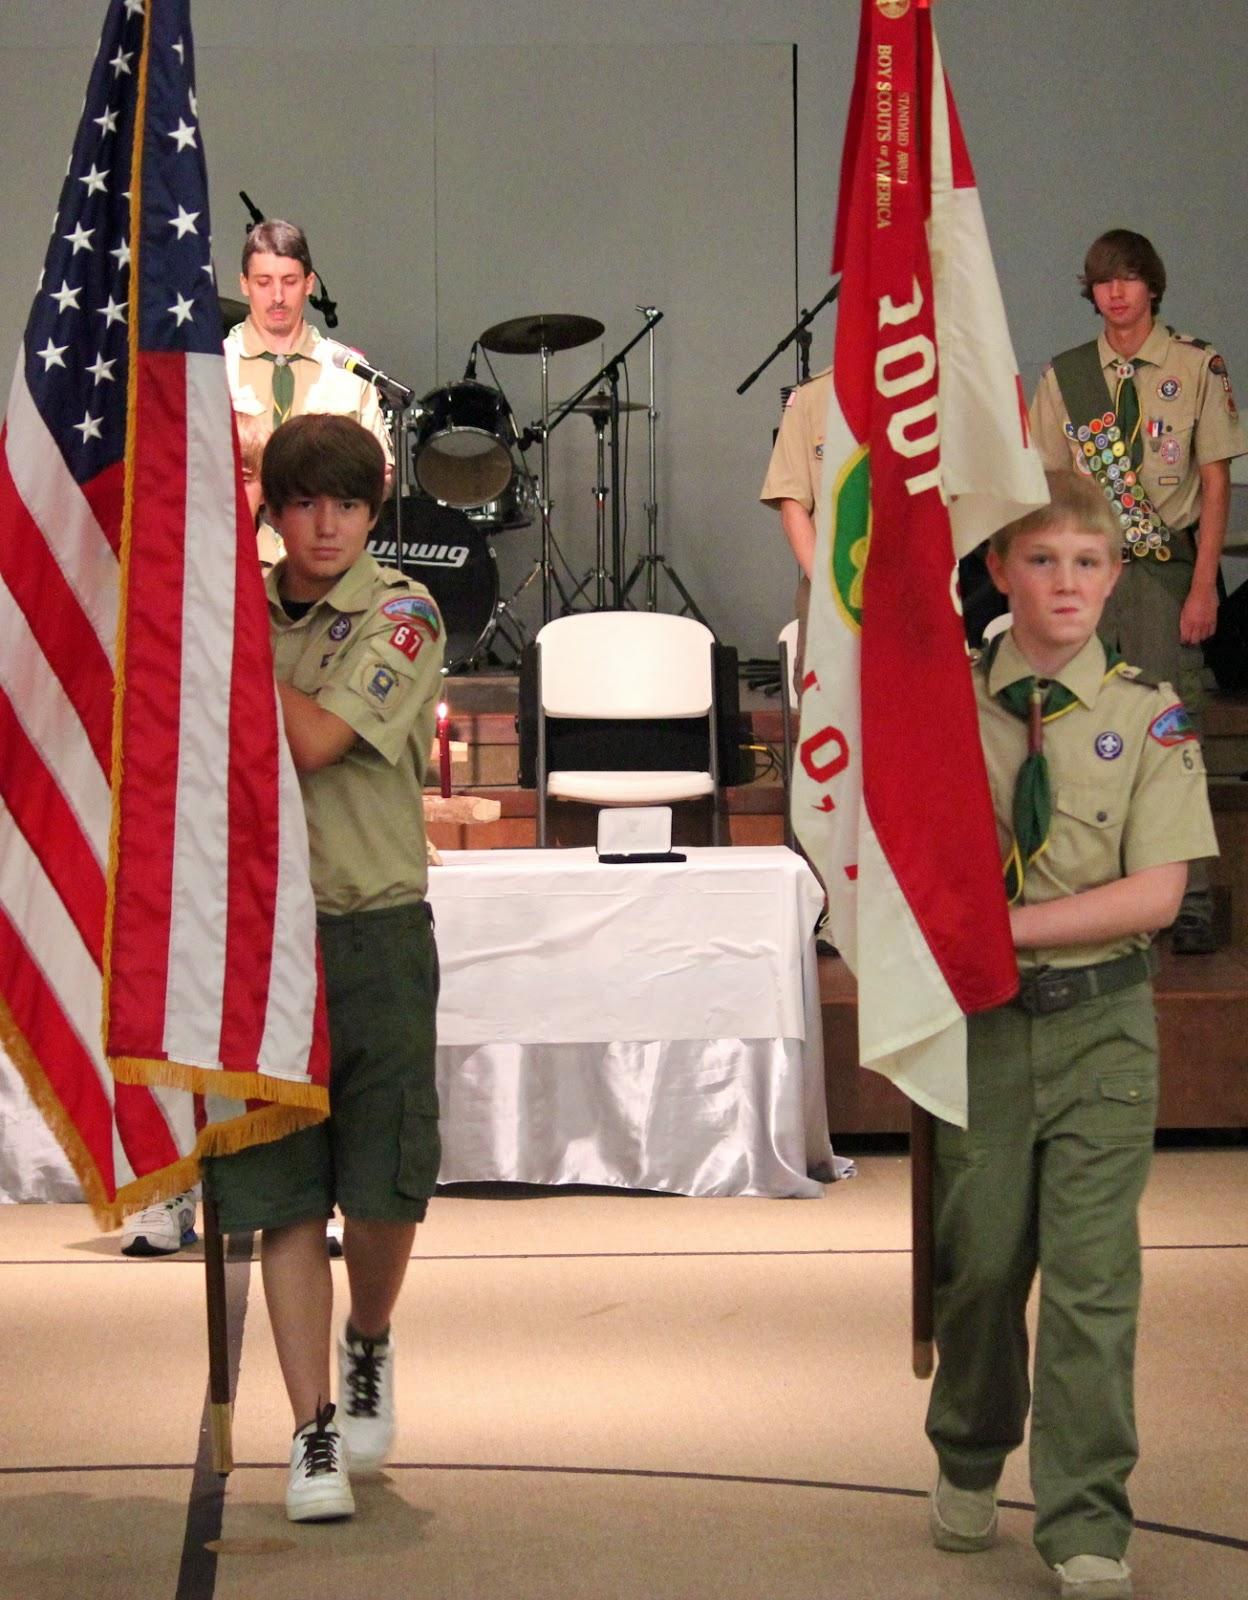 September 2013 - BSA Troop 67, Monticello, AR, USA